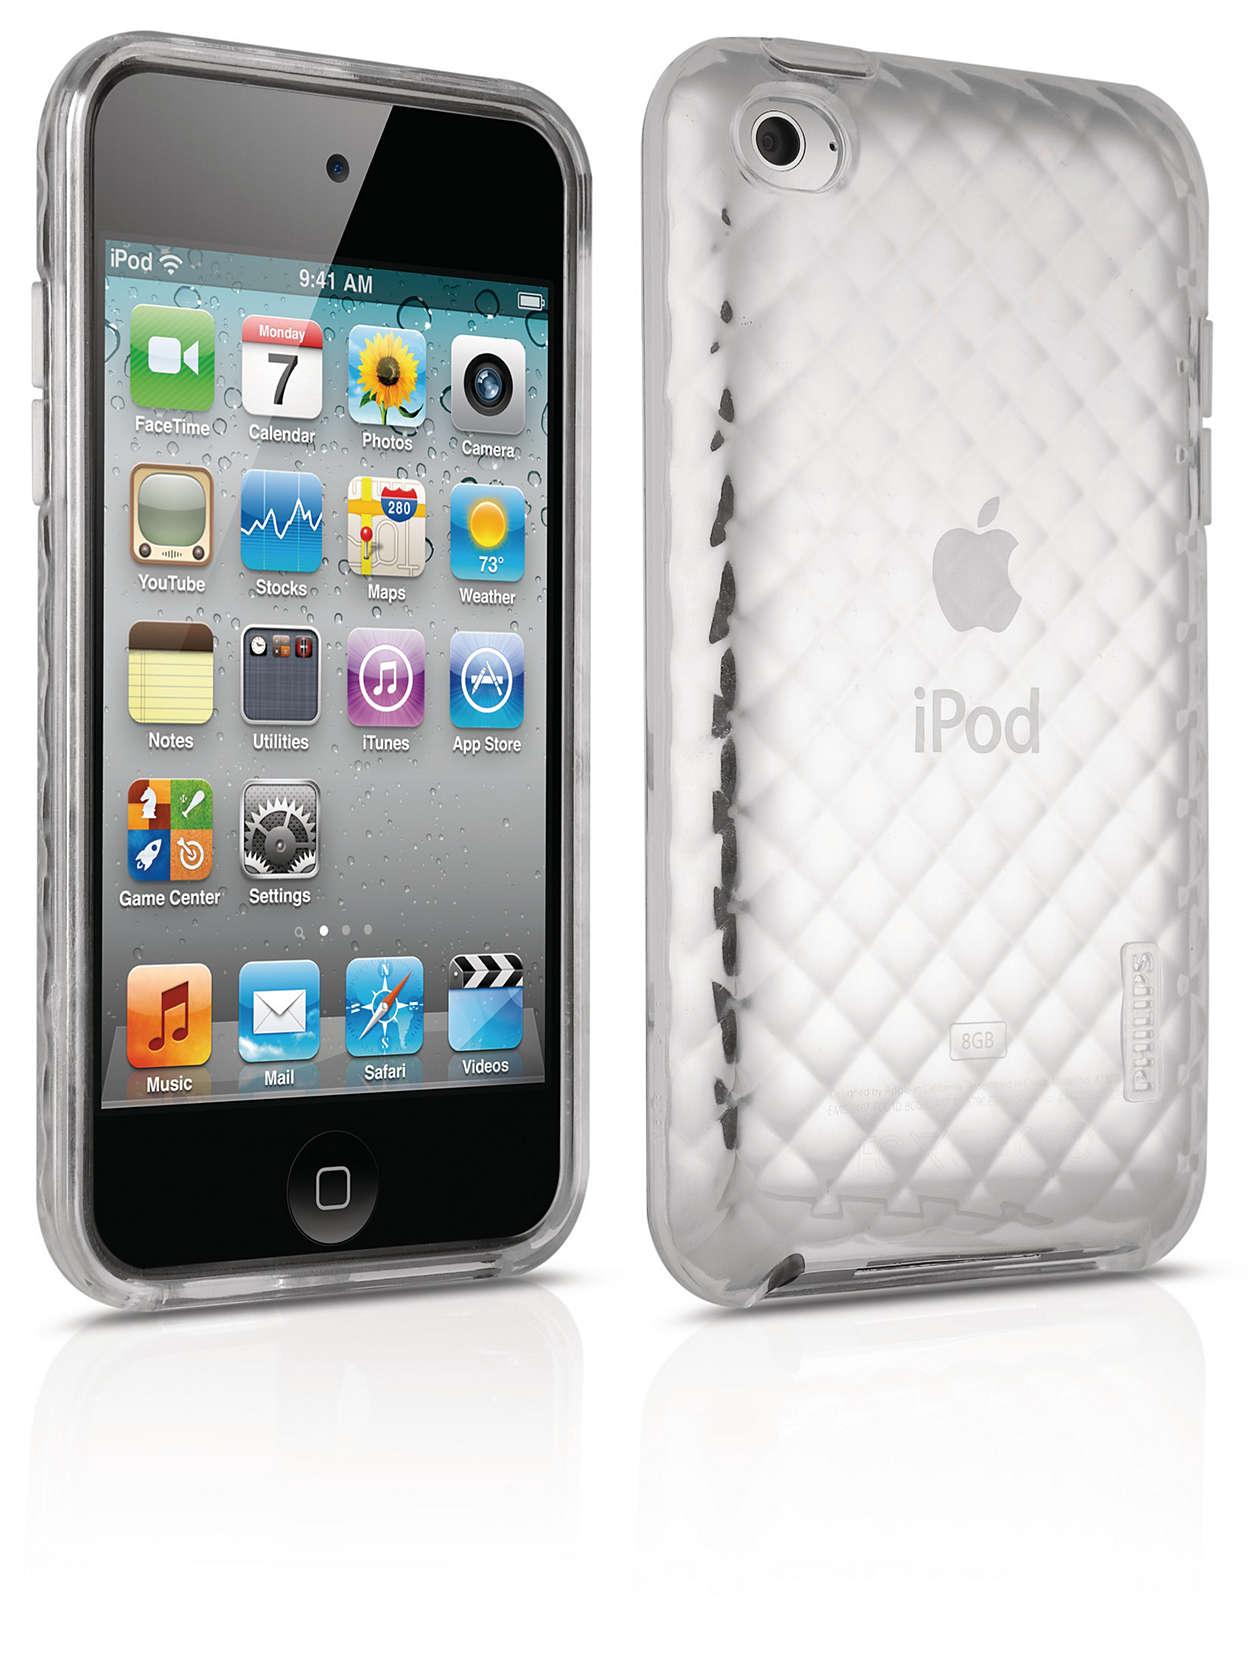 Beskyt din iPod i et fleksibelt etui